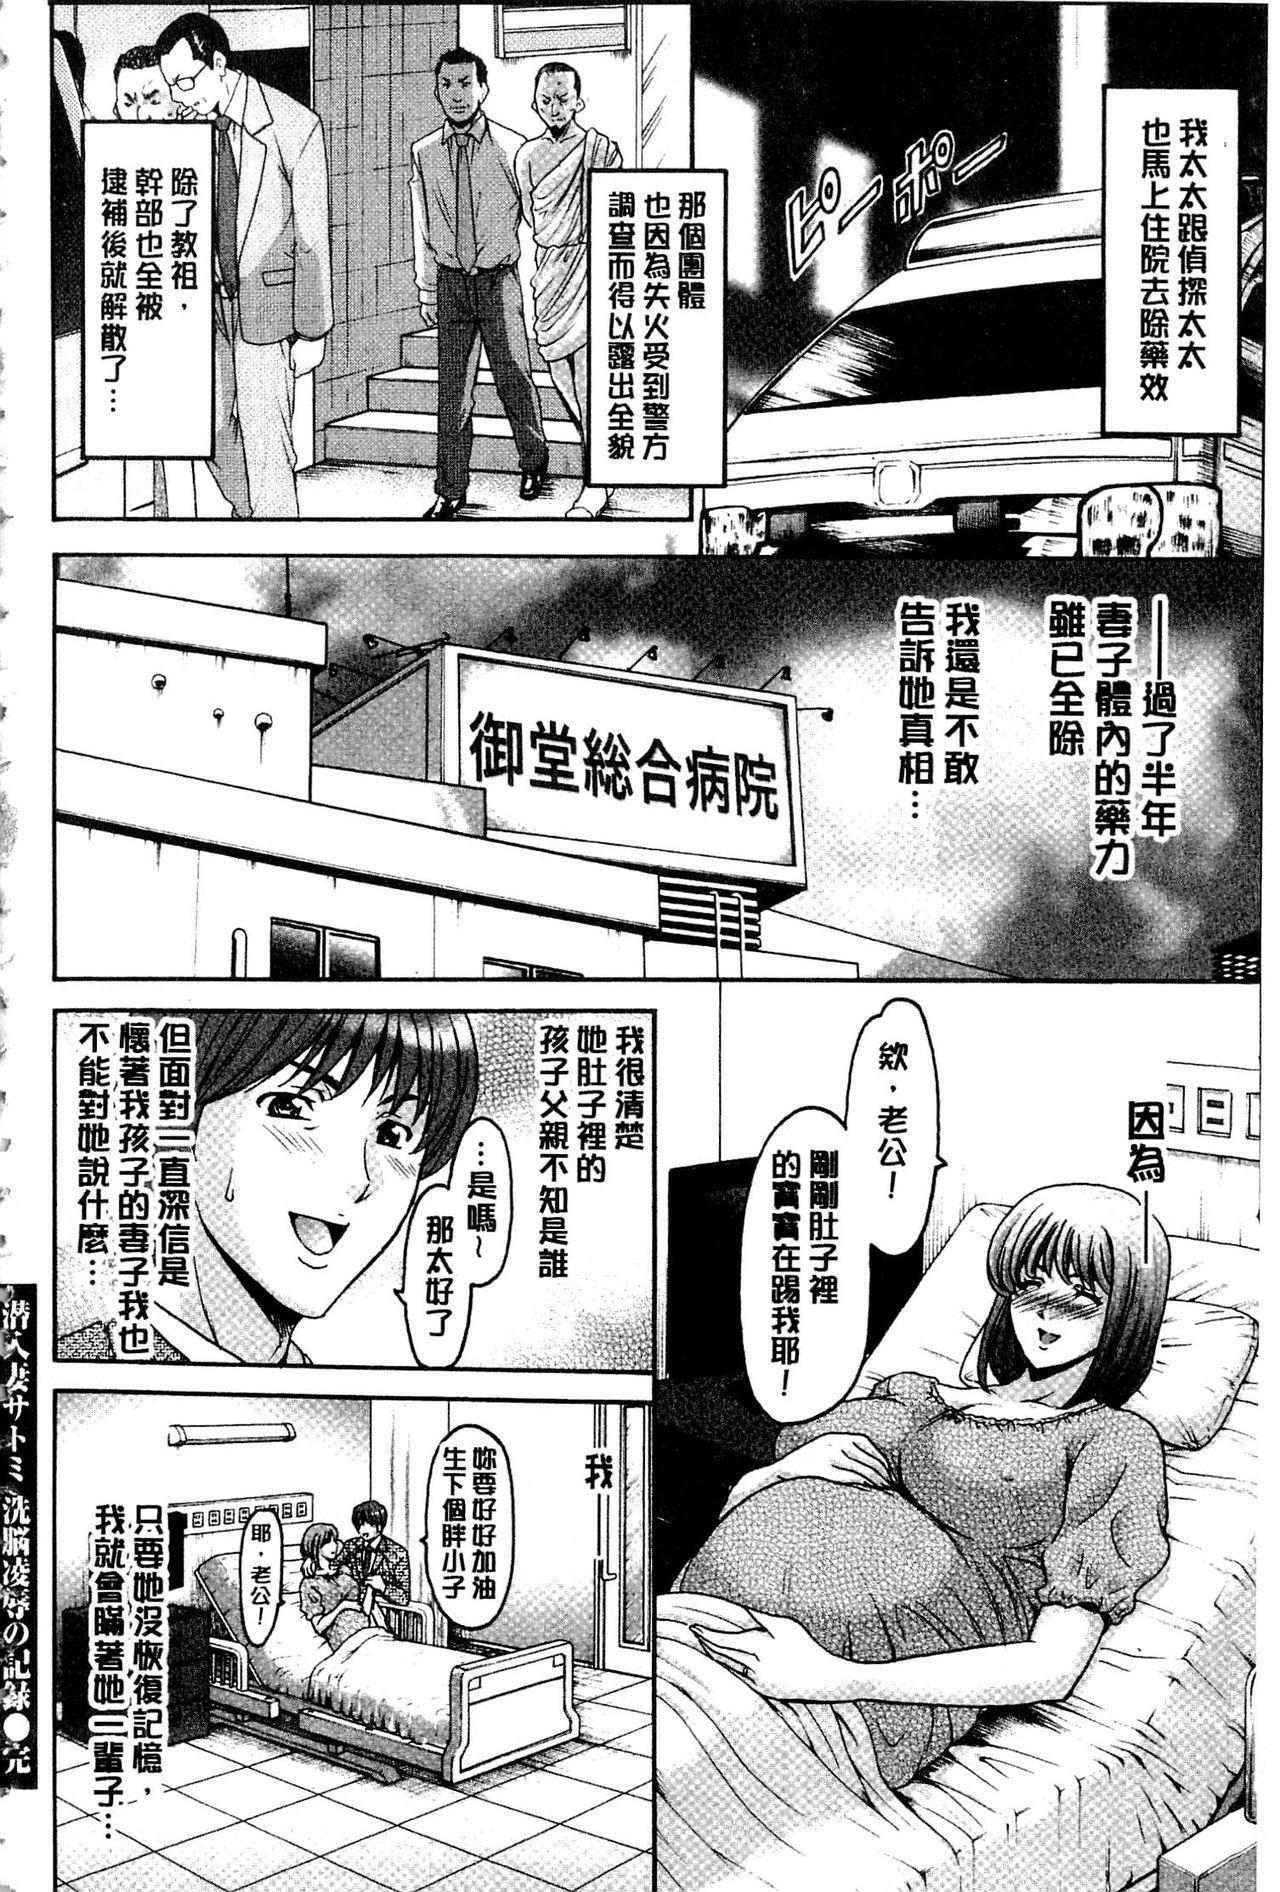 Sennyu Tsuma Satomi Kiroku   臥底人妻里美 洗腦凌辱的記錄 下集 186